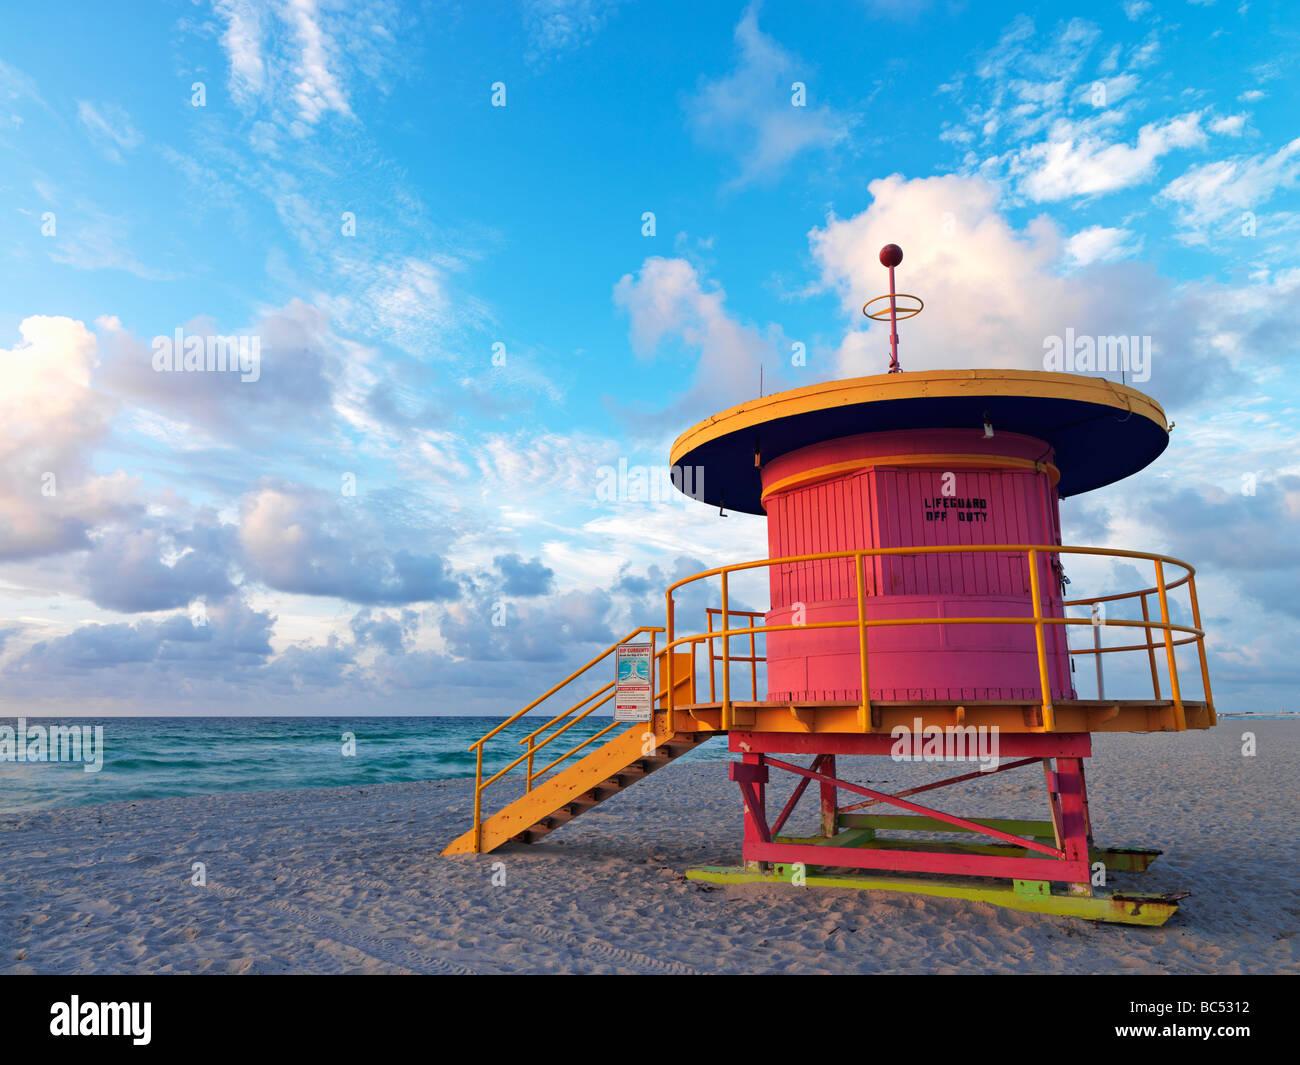 Art Deco style lifeguard station  on South Beach Miami at sunrise Stock Photo